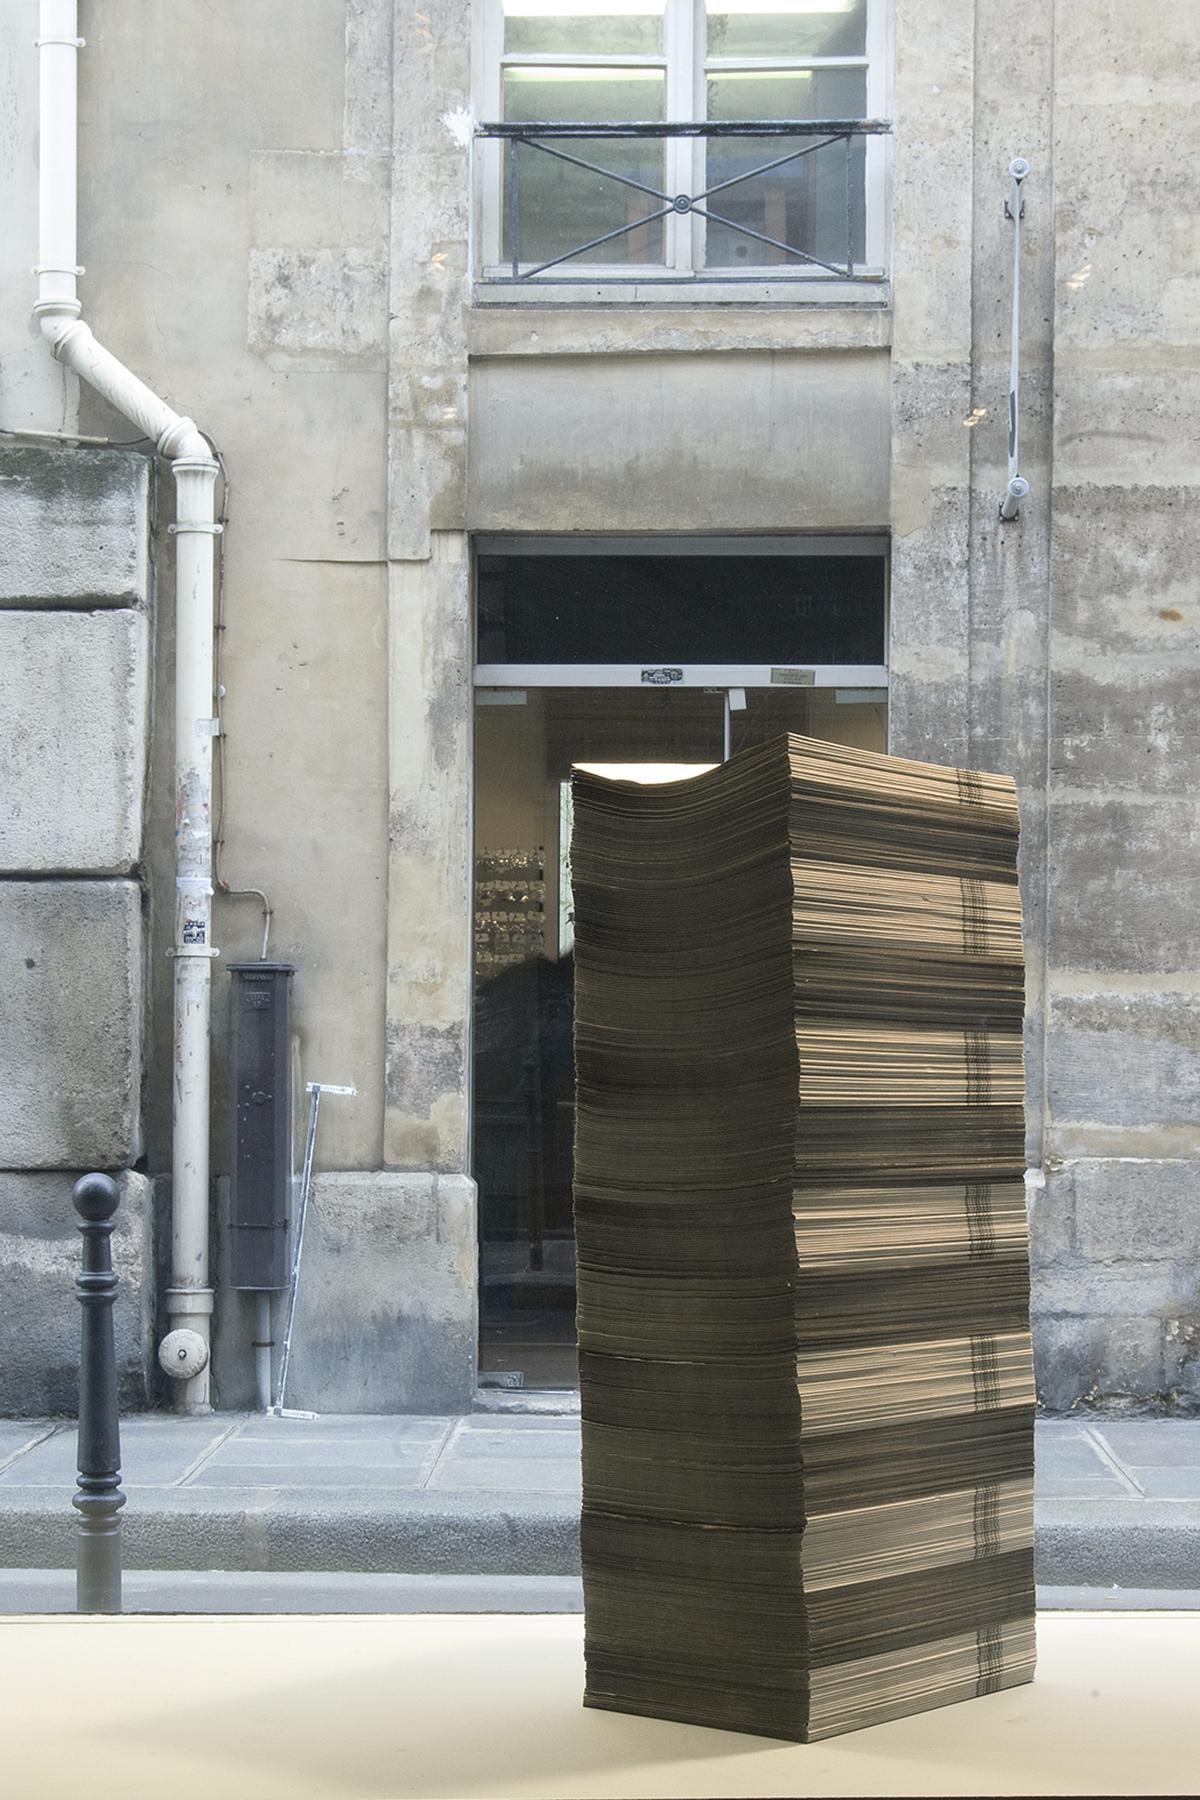 pile of newspapers at Le Petit Endroit Paris, 2012